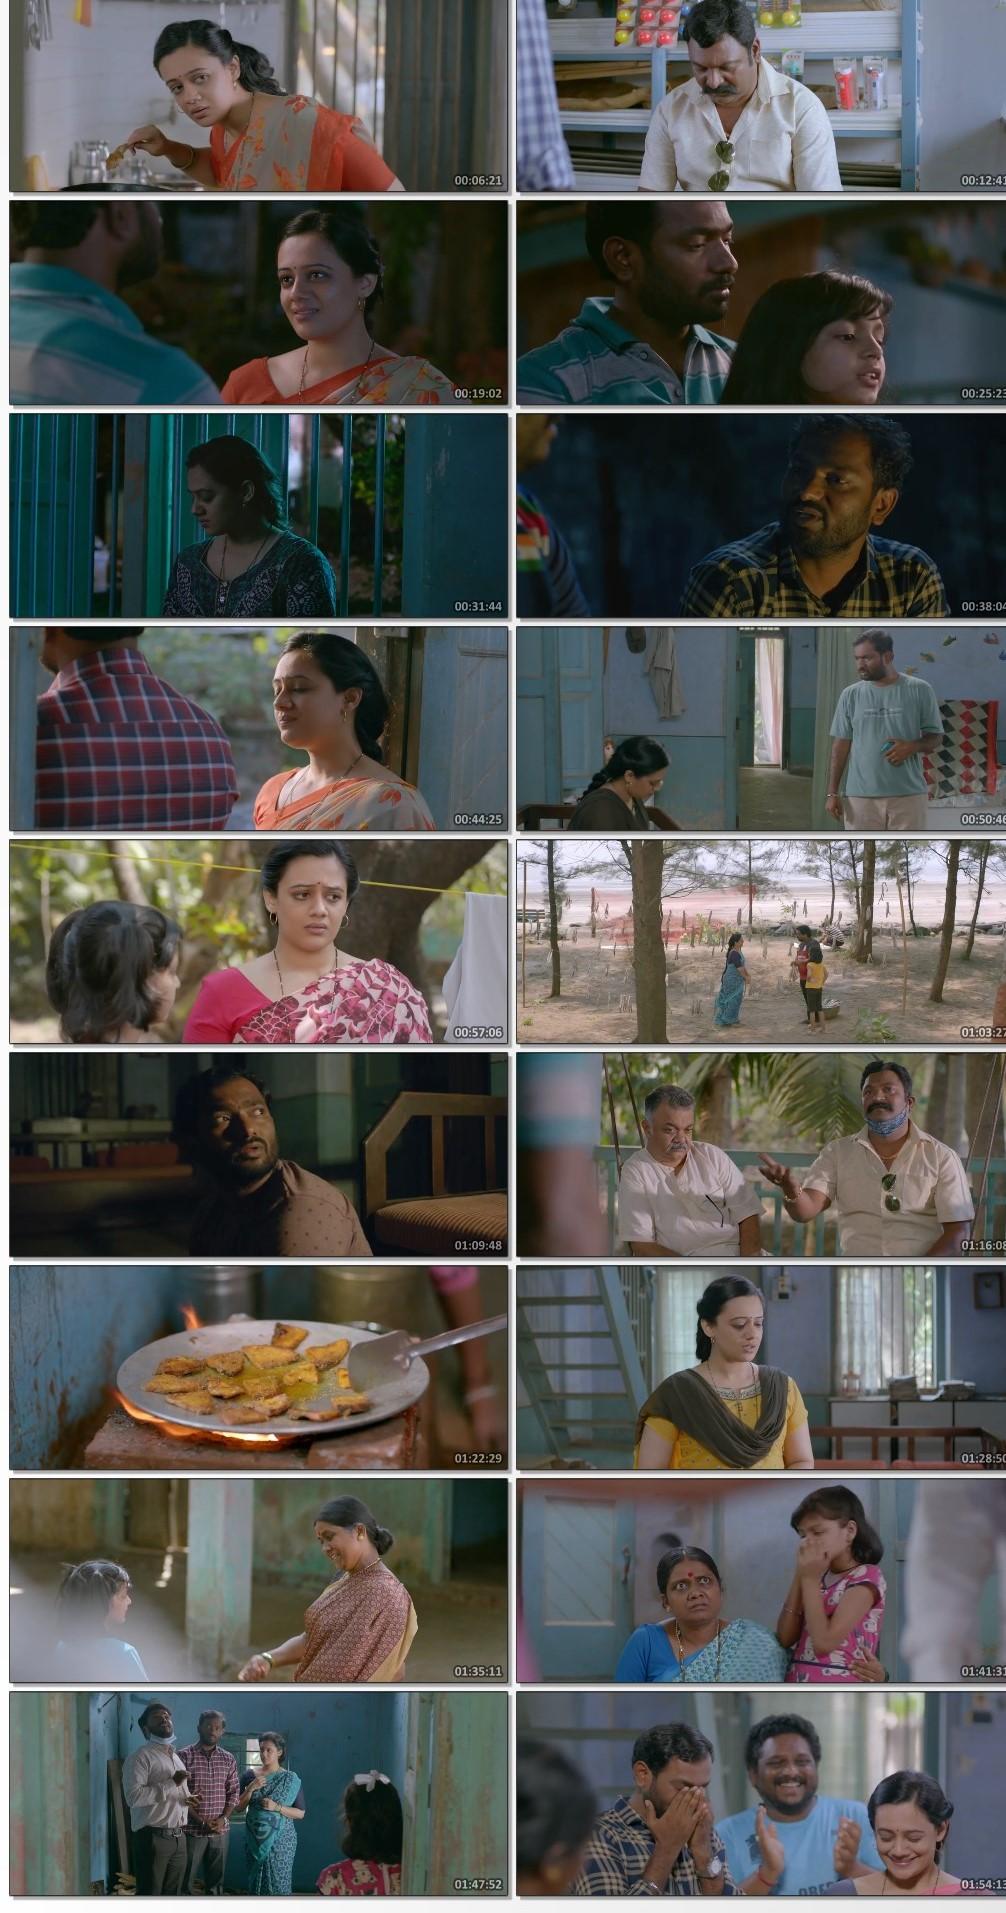 Punahashcha-Hari-Om-2021-Marathi-720p-WEB-DL-x264-1-mkv-thumbs